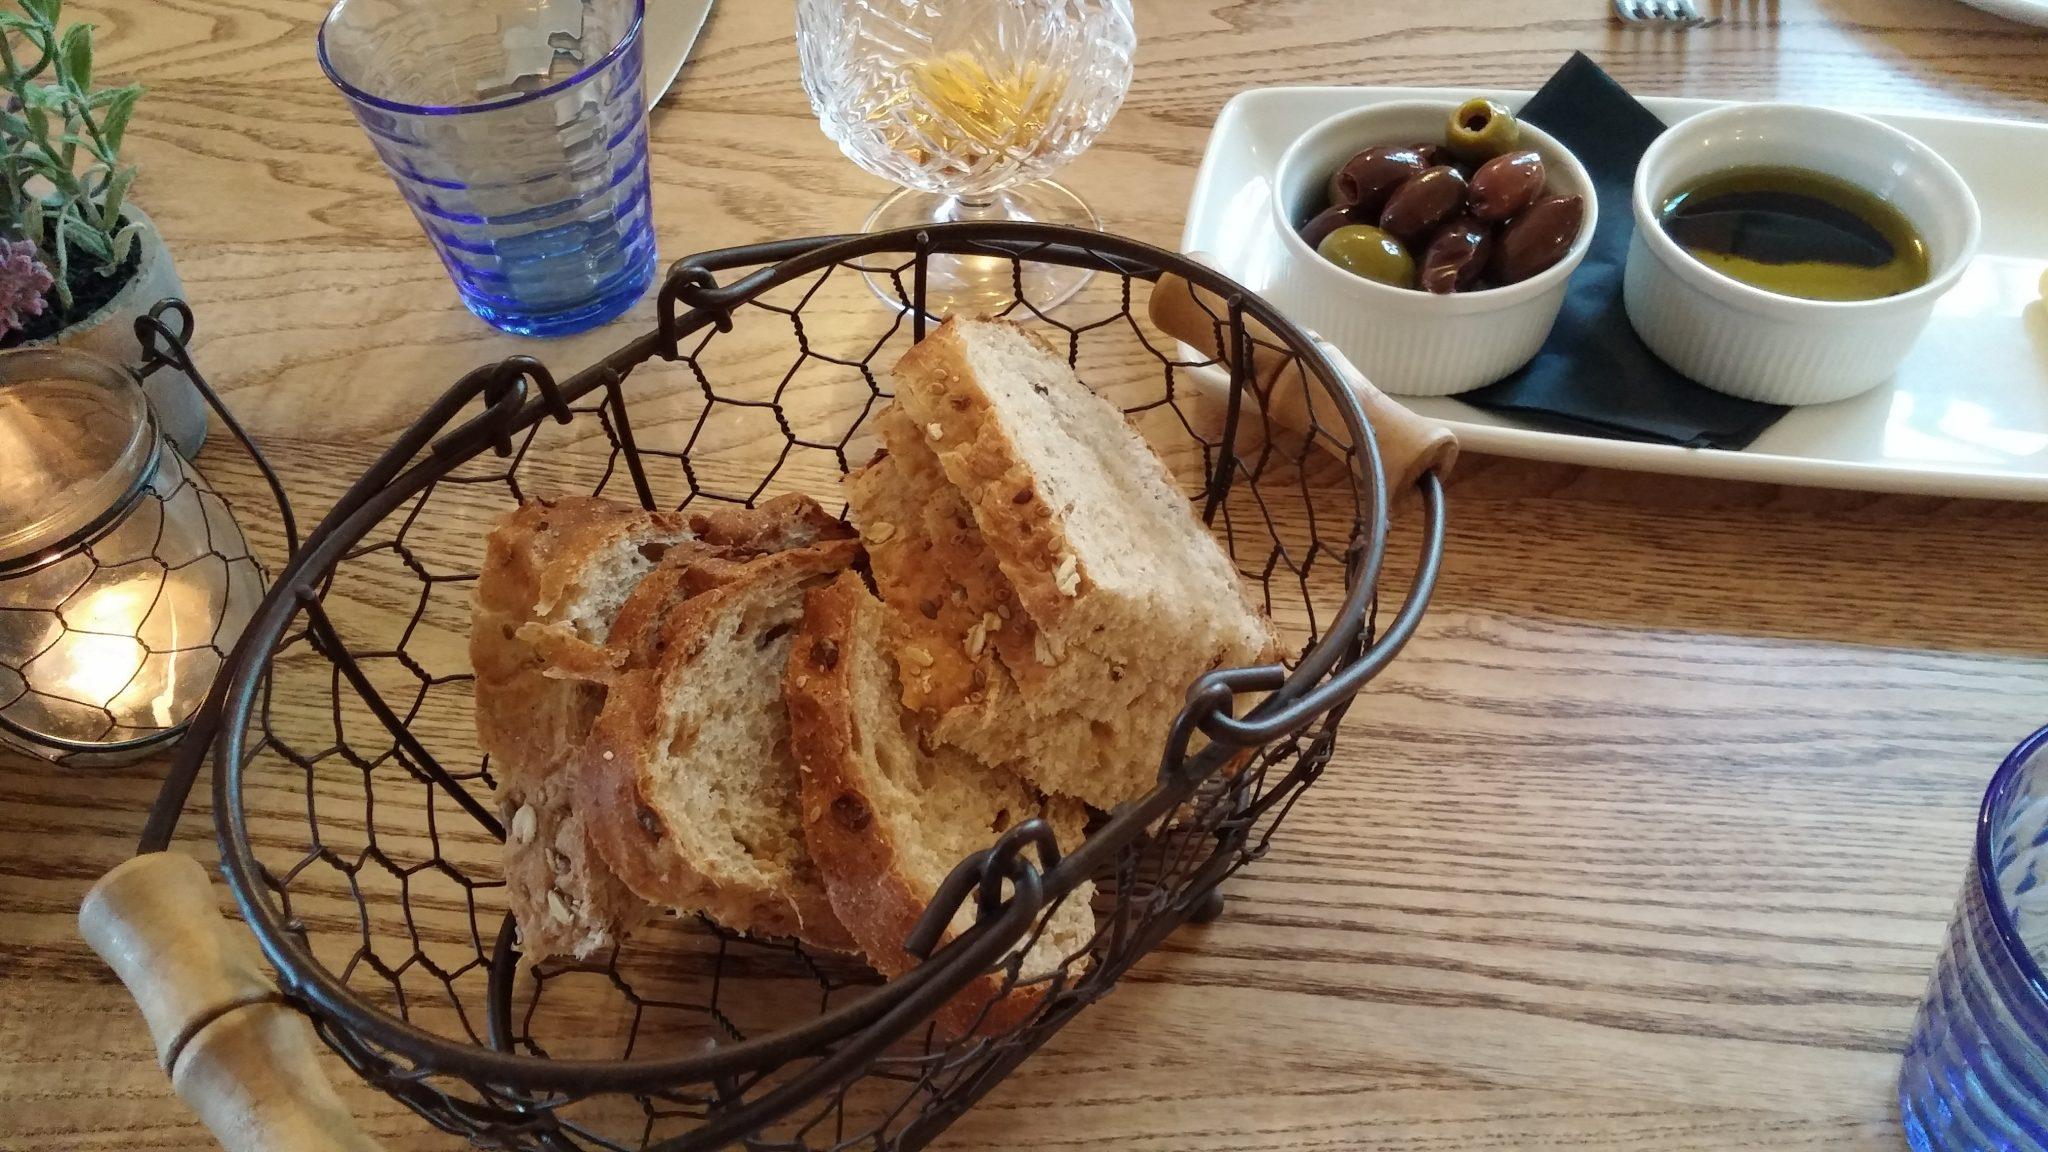 Artisan bread, olives, dipping oils